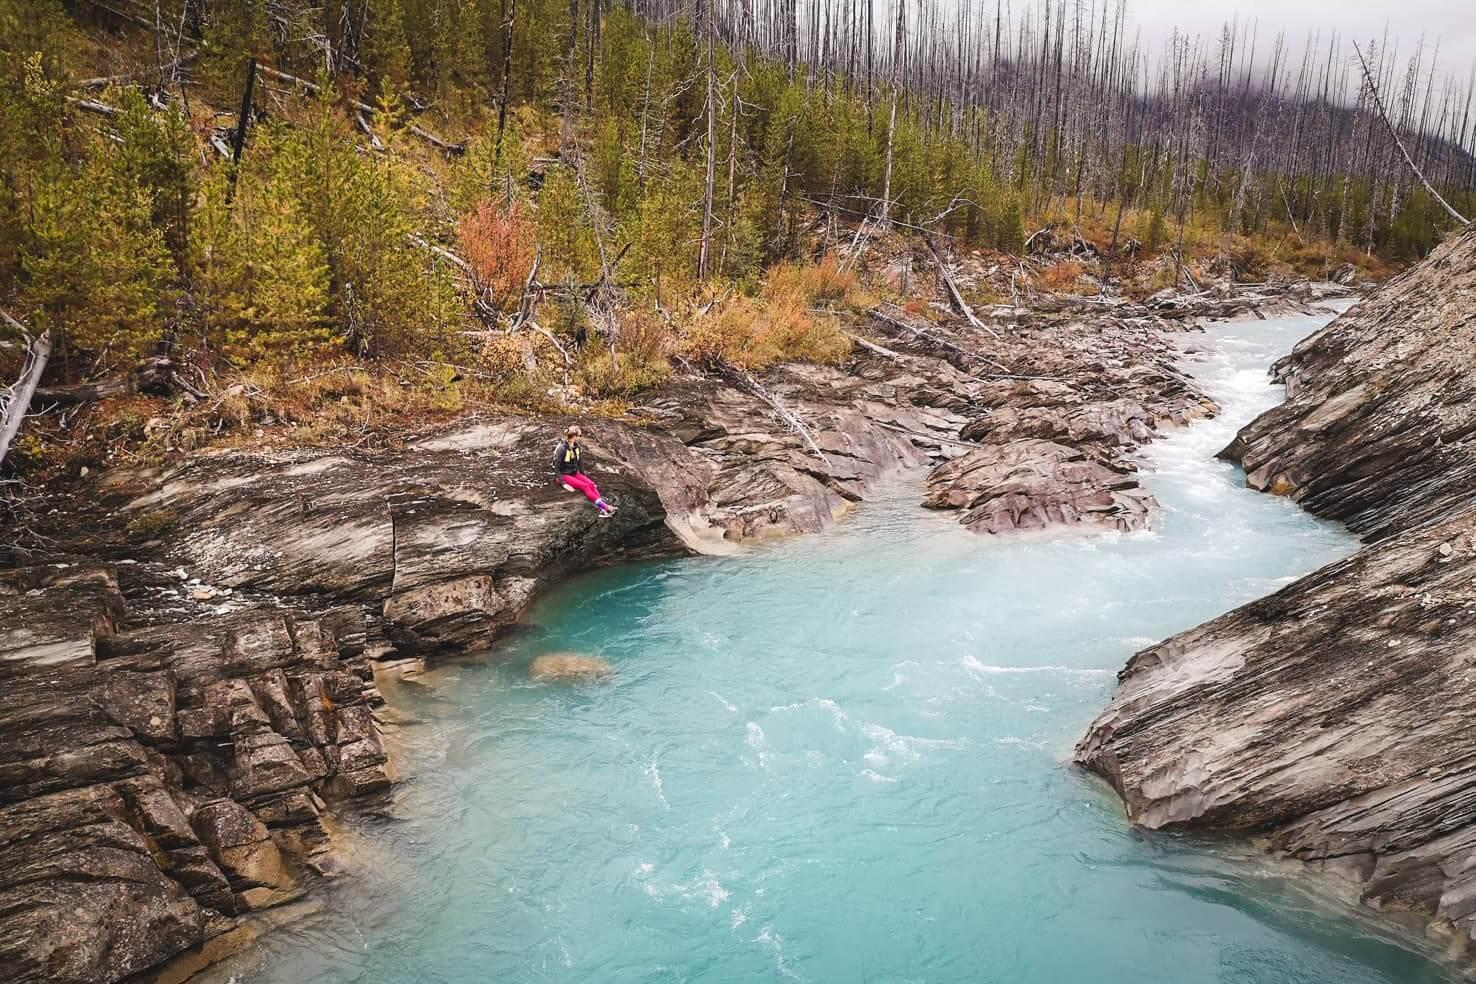 Canadian Rockies road trip itinerary - Kootenay River in Kootenay National Park